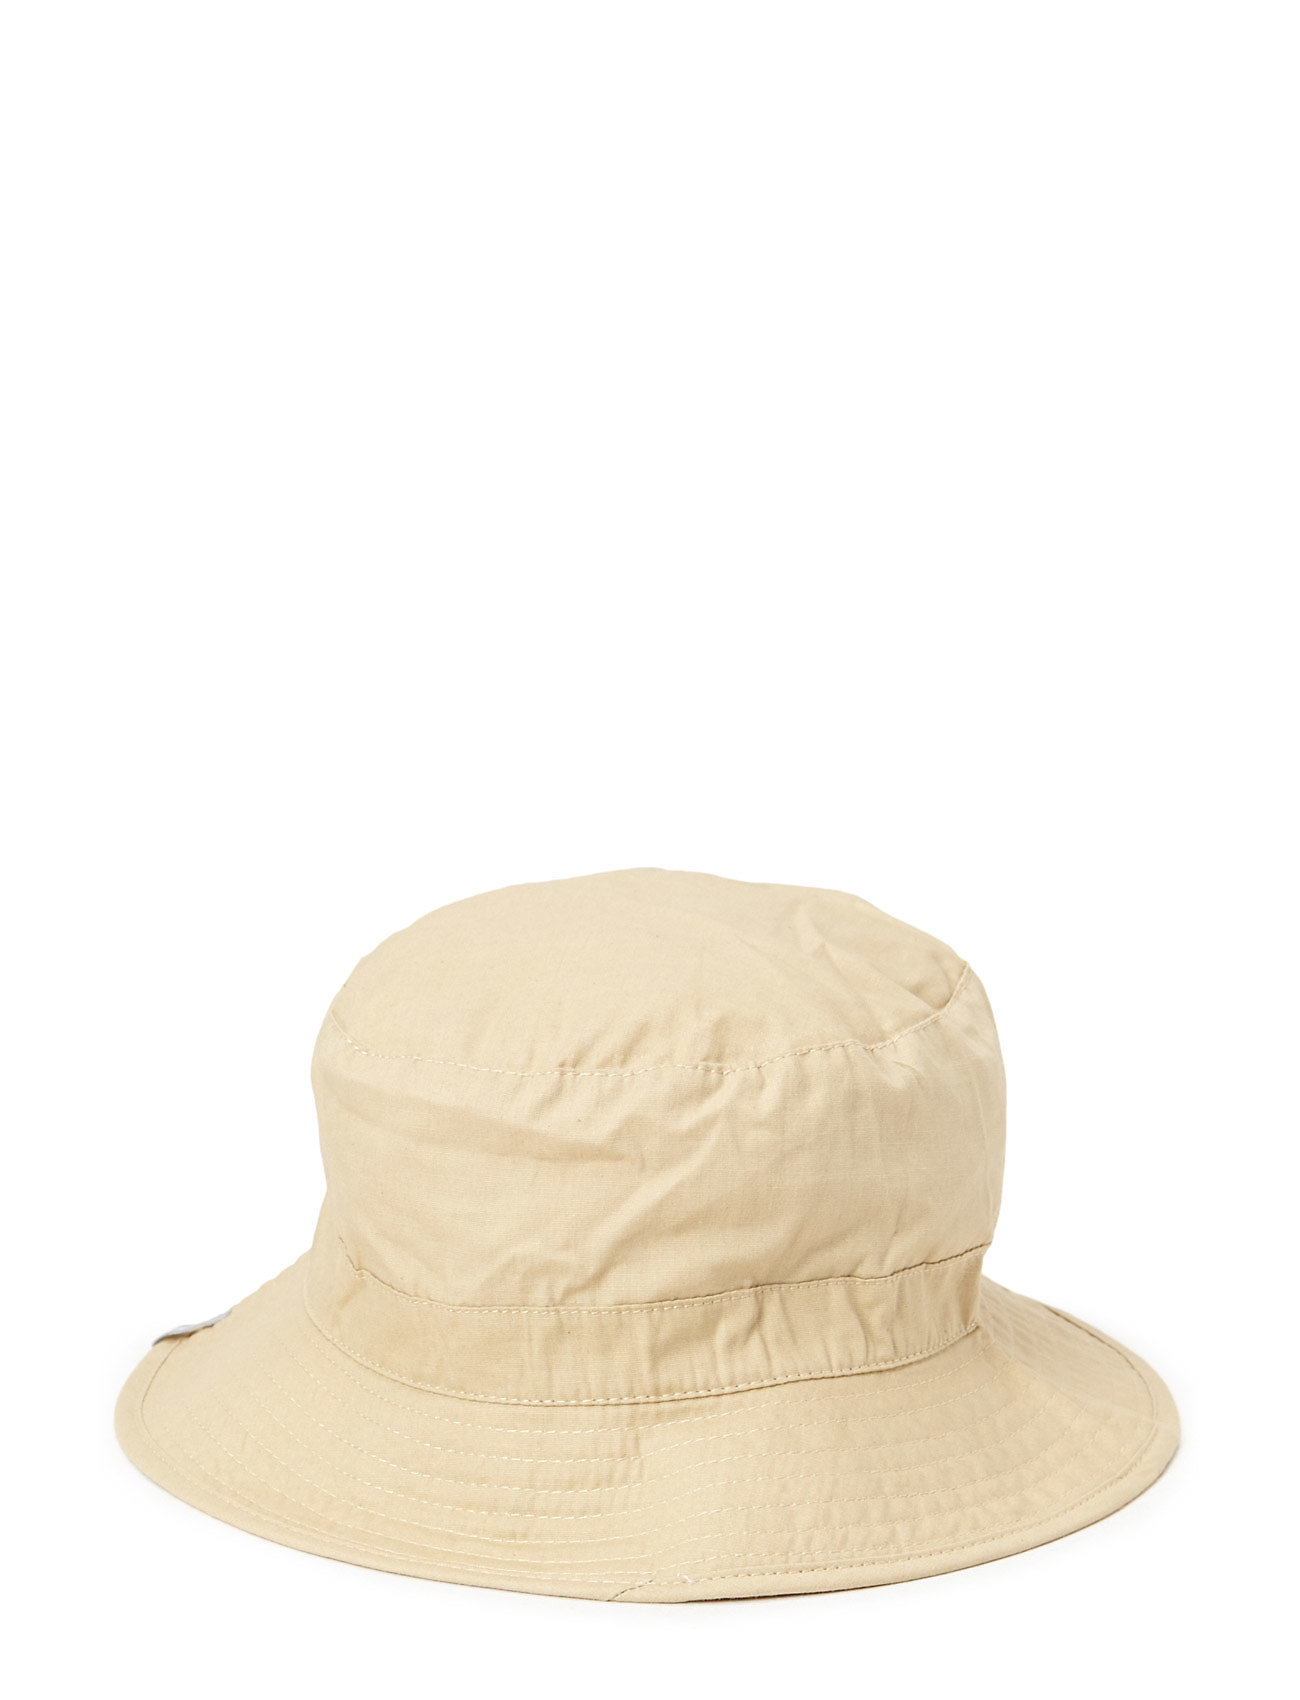 Melton Bucket Hat - Solid colour